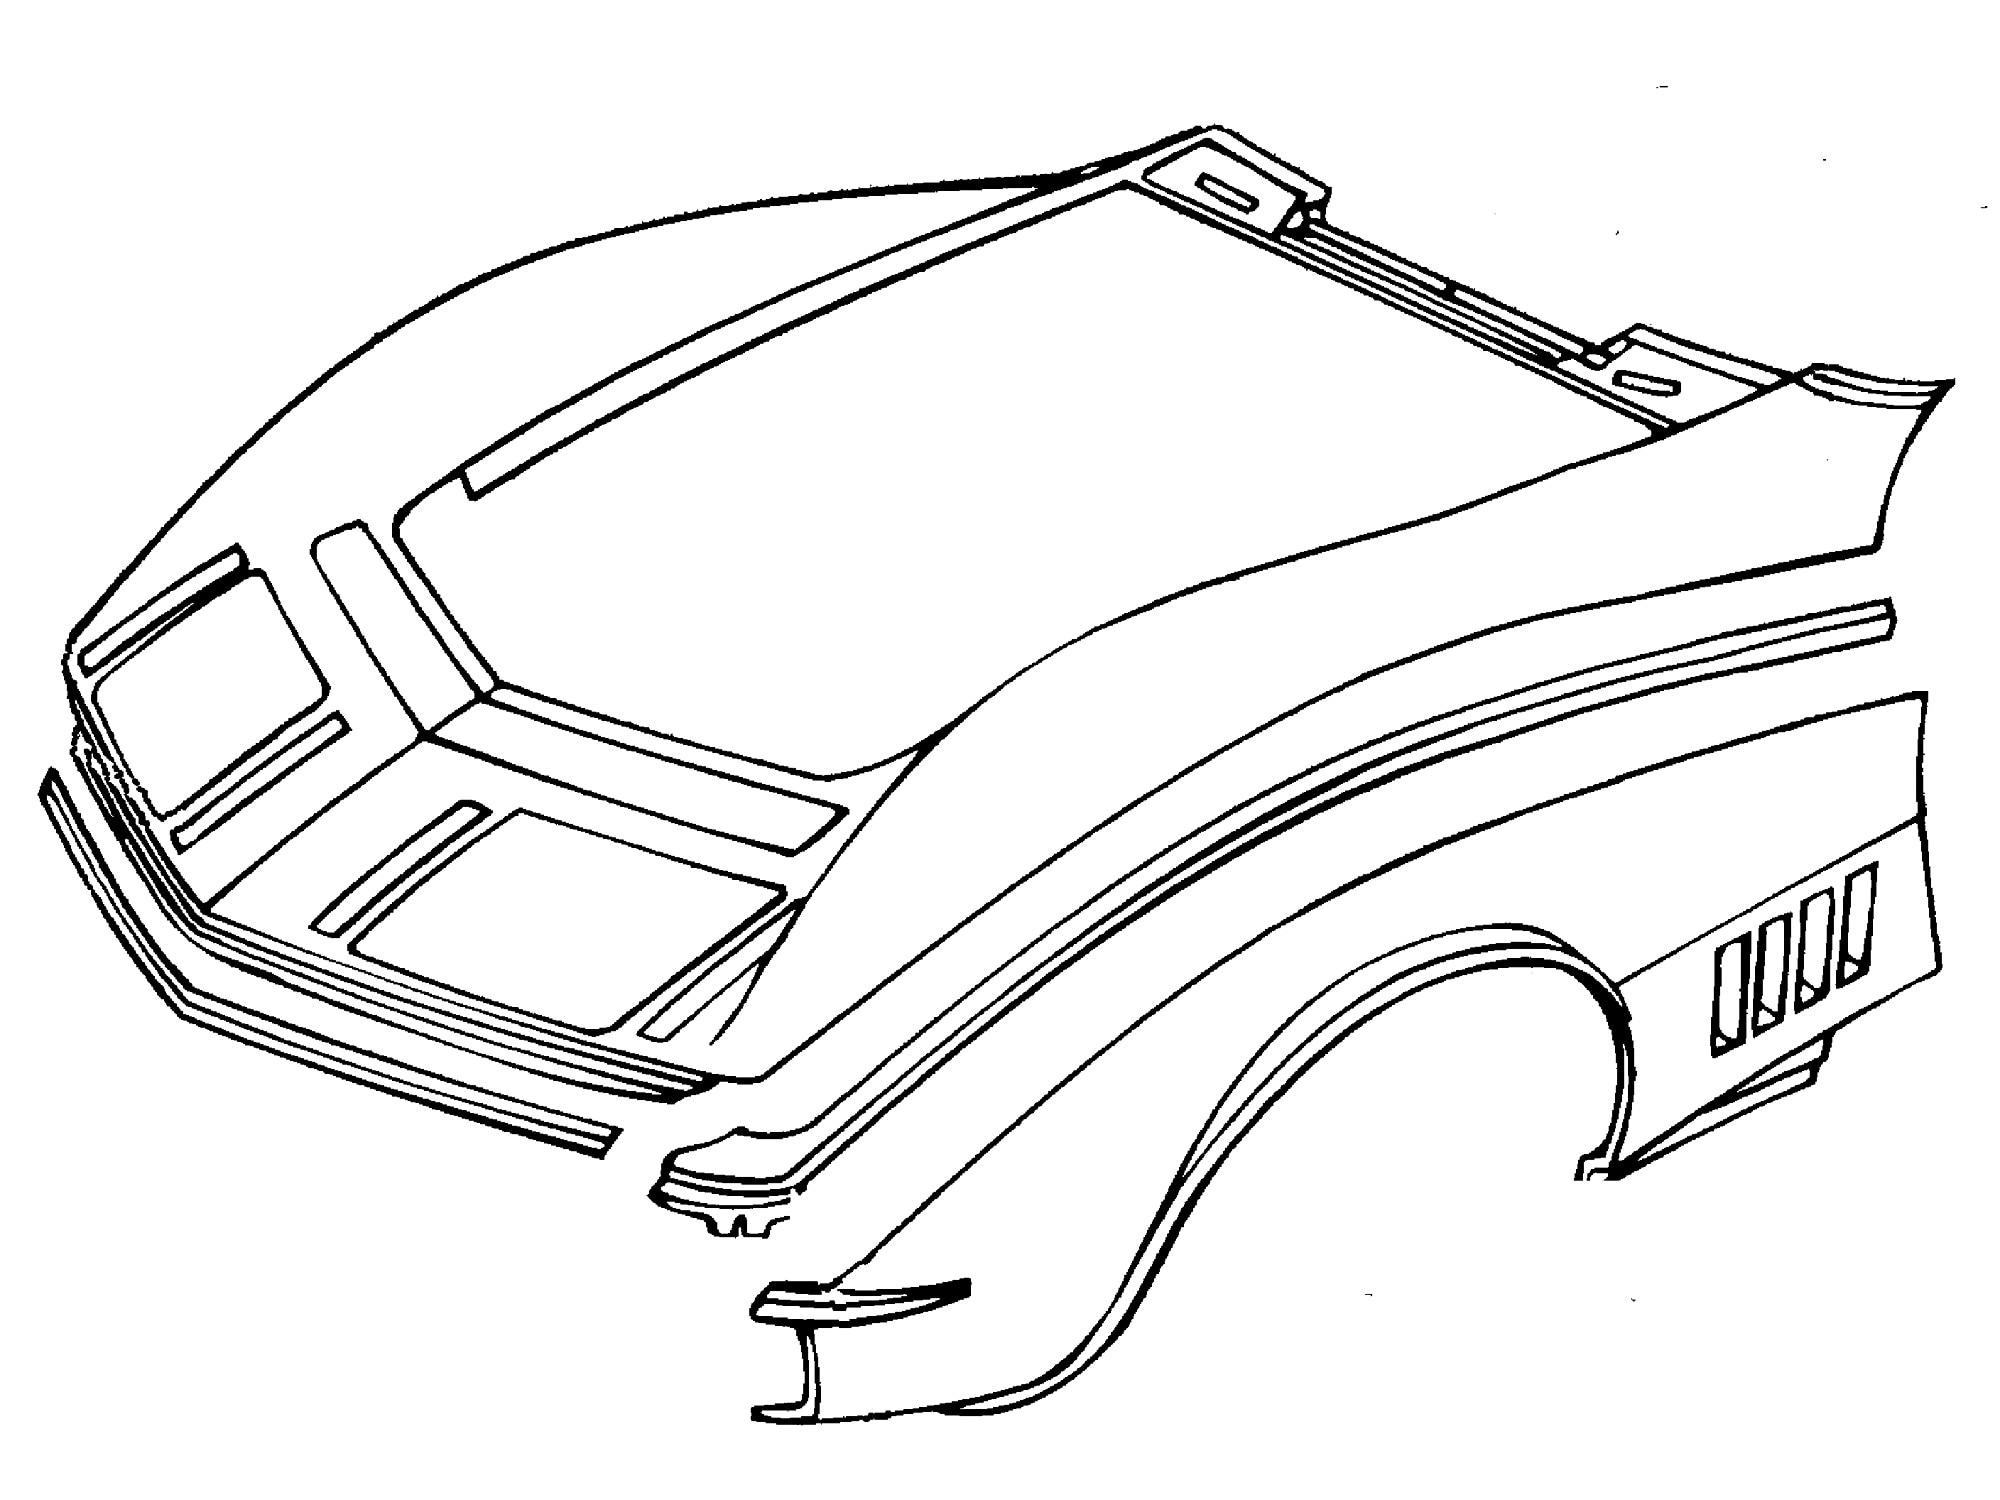 Repairing Your Corvette's Minor Fiberglass Damage